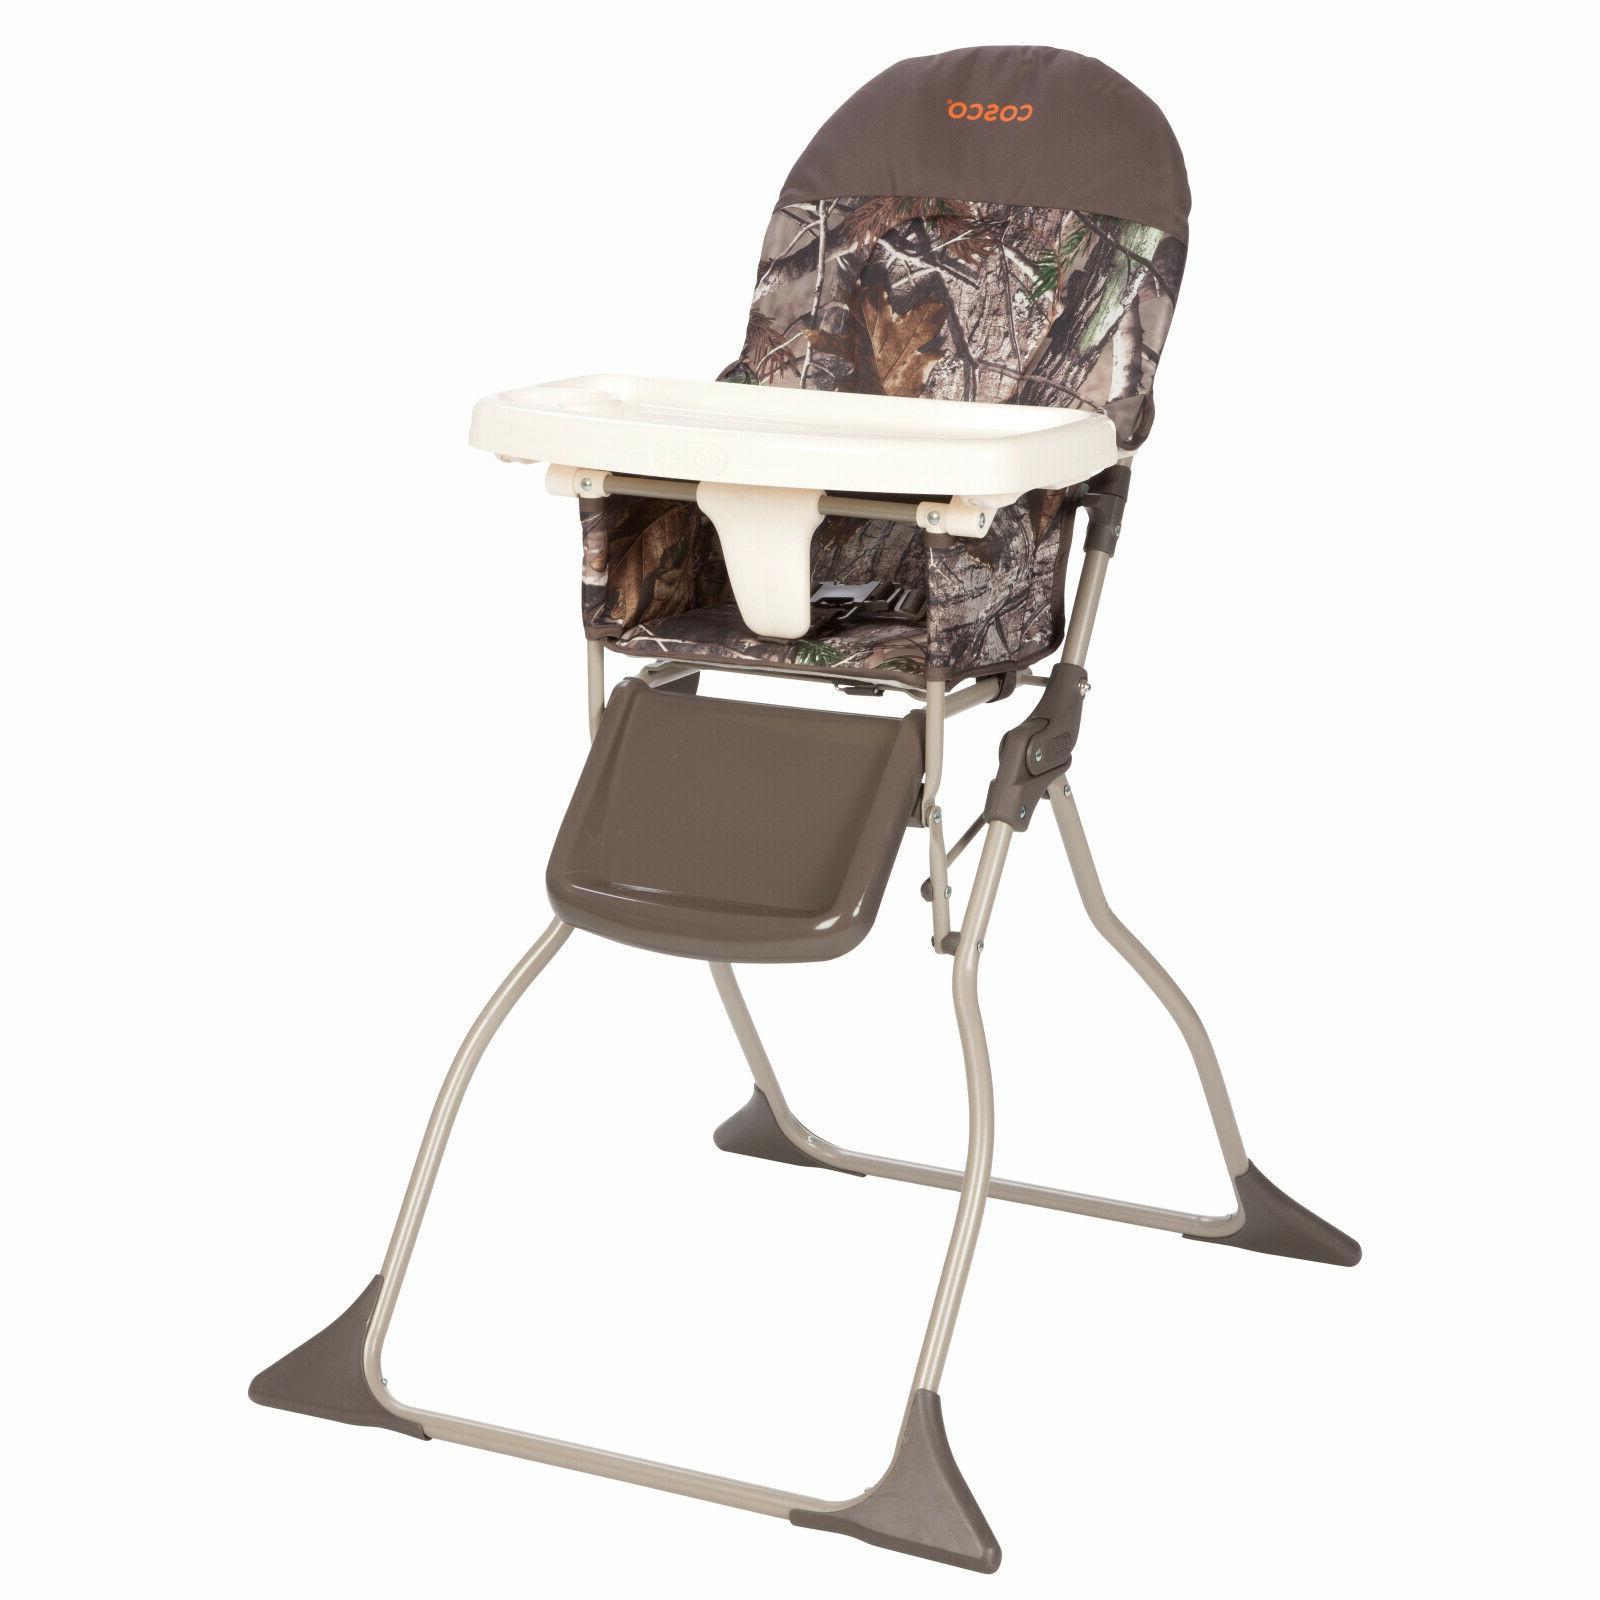 Cosco Simple Fold High Chair Camo Realtree/Orange